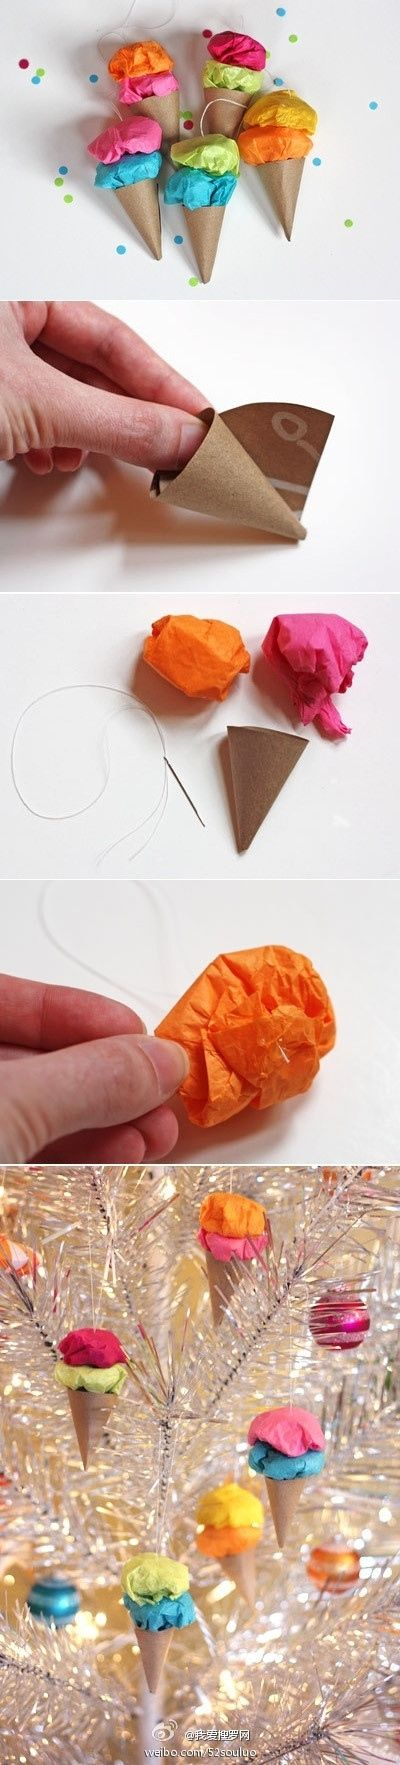 Easy paper ice cream ornaments DIY